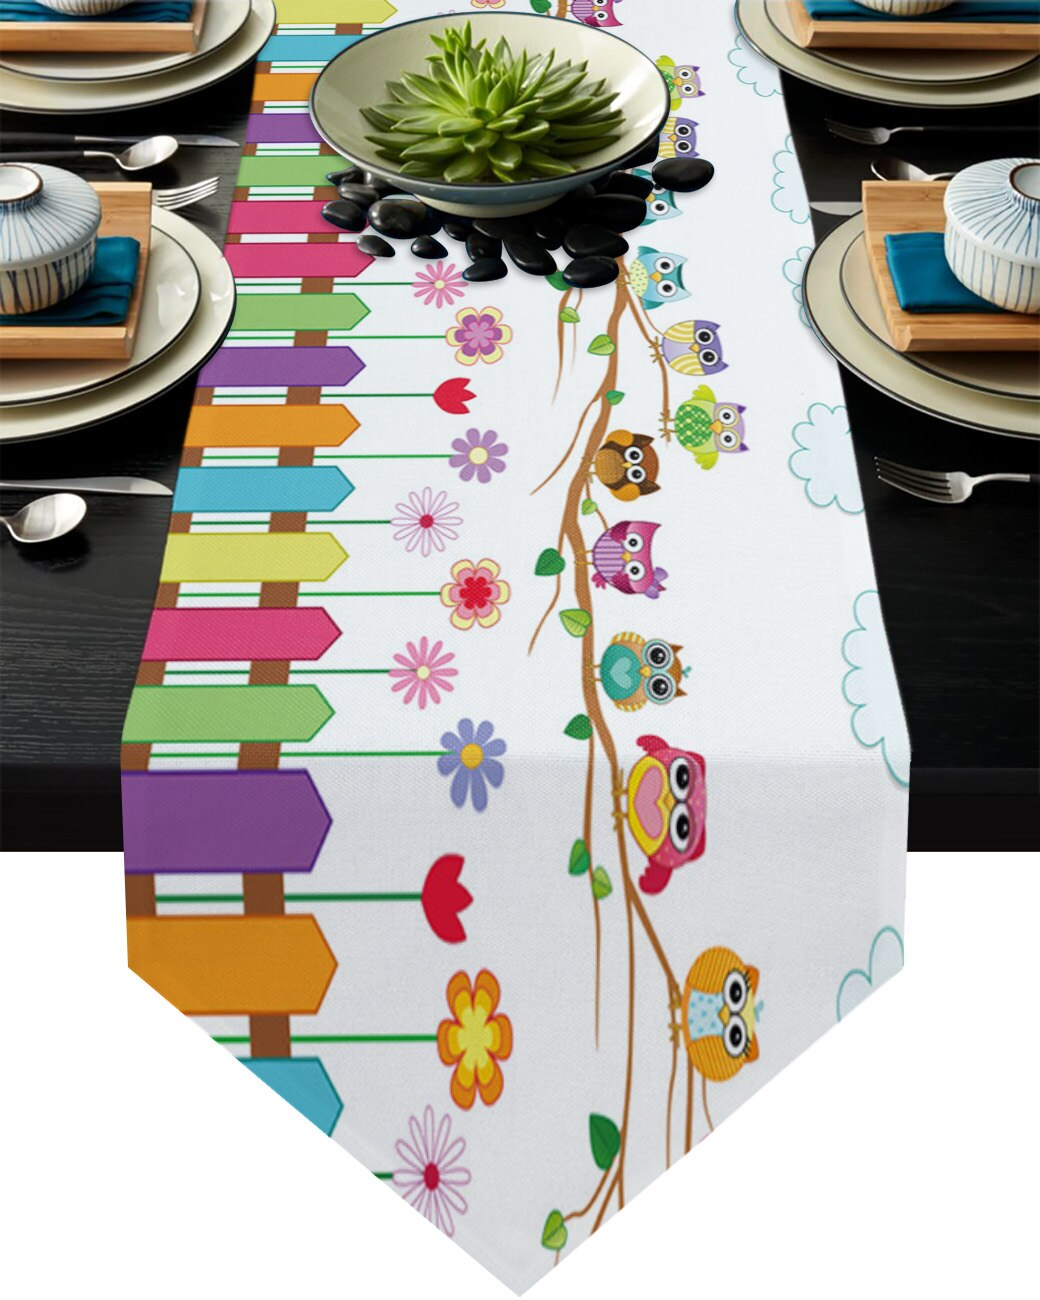 Chico de dibujos animados lindo búho camino de mesa casa cocina camino decorativo para mesa para boda pastel Floral mantel